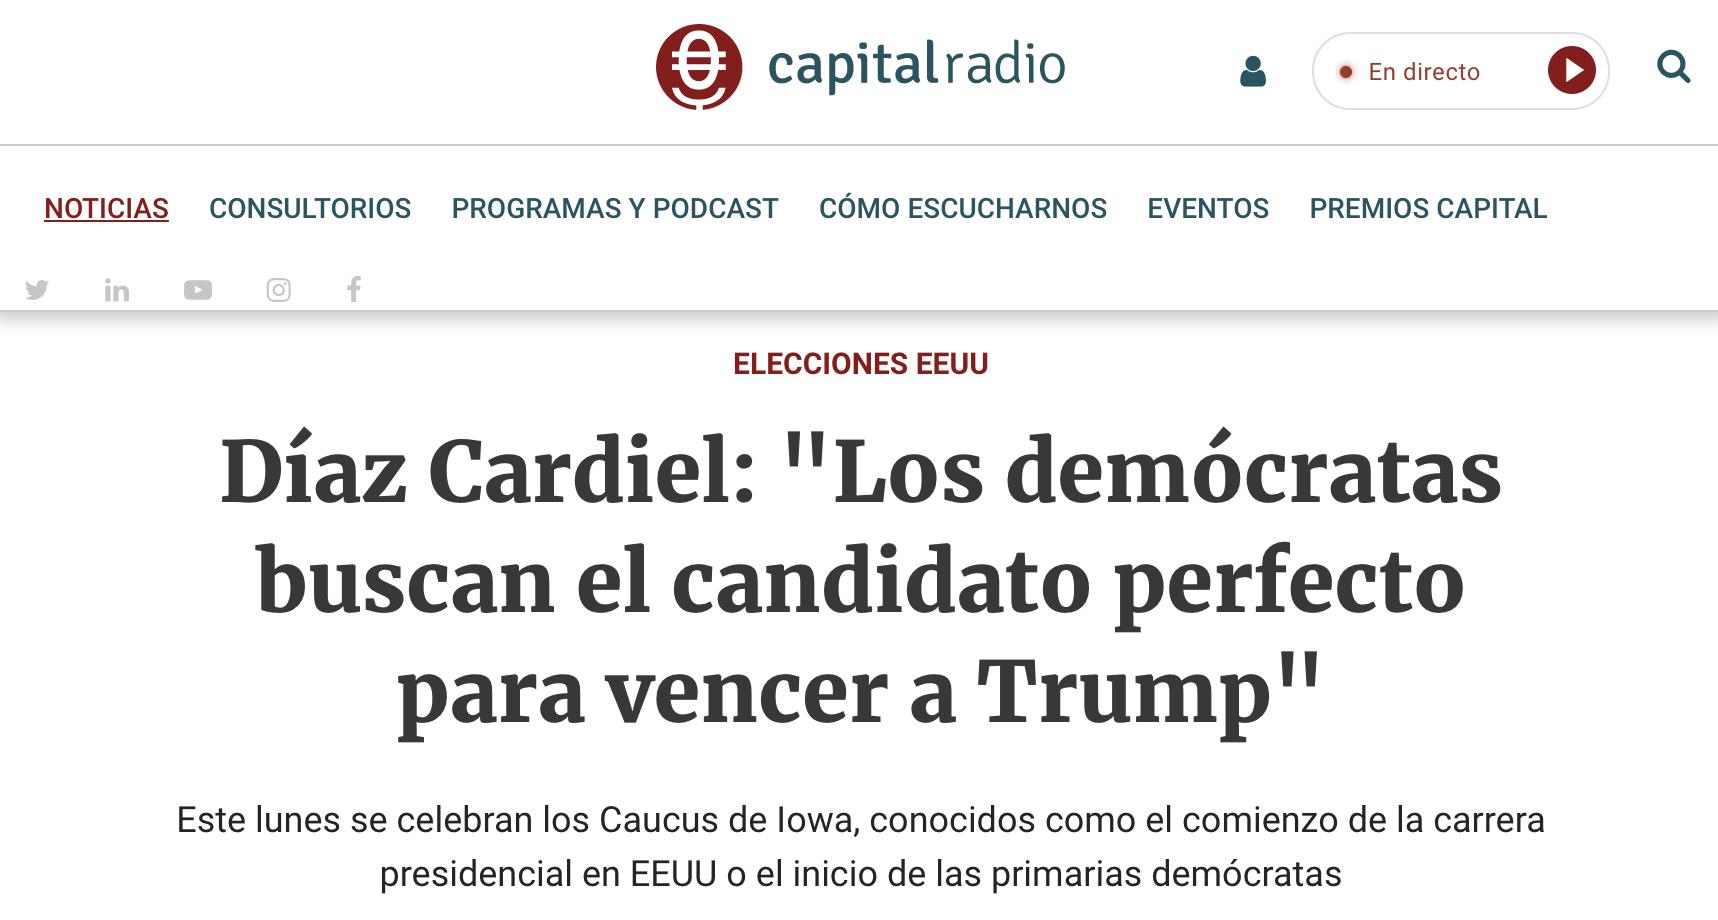 Article by Jorge Díaz-Cardiel in Capital Radio